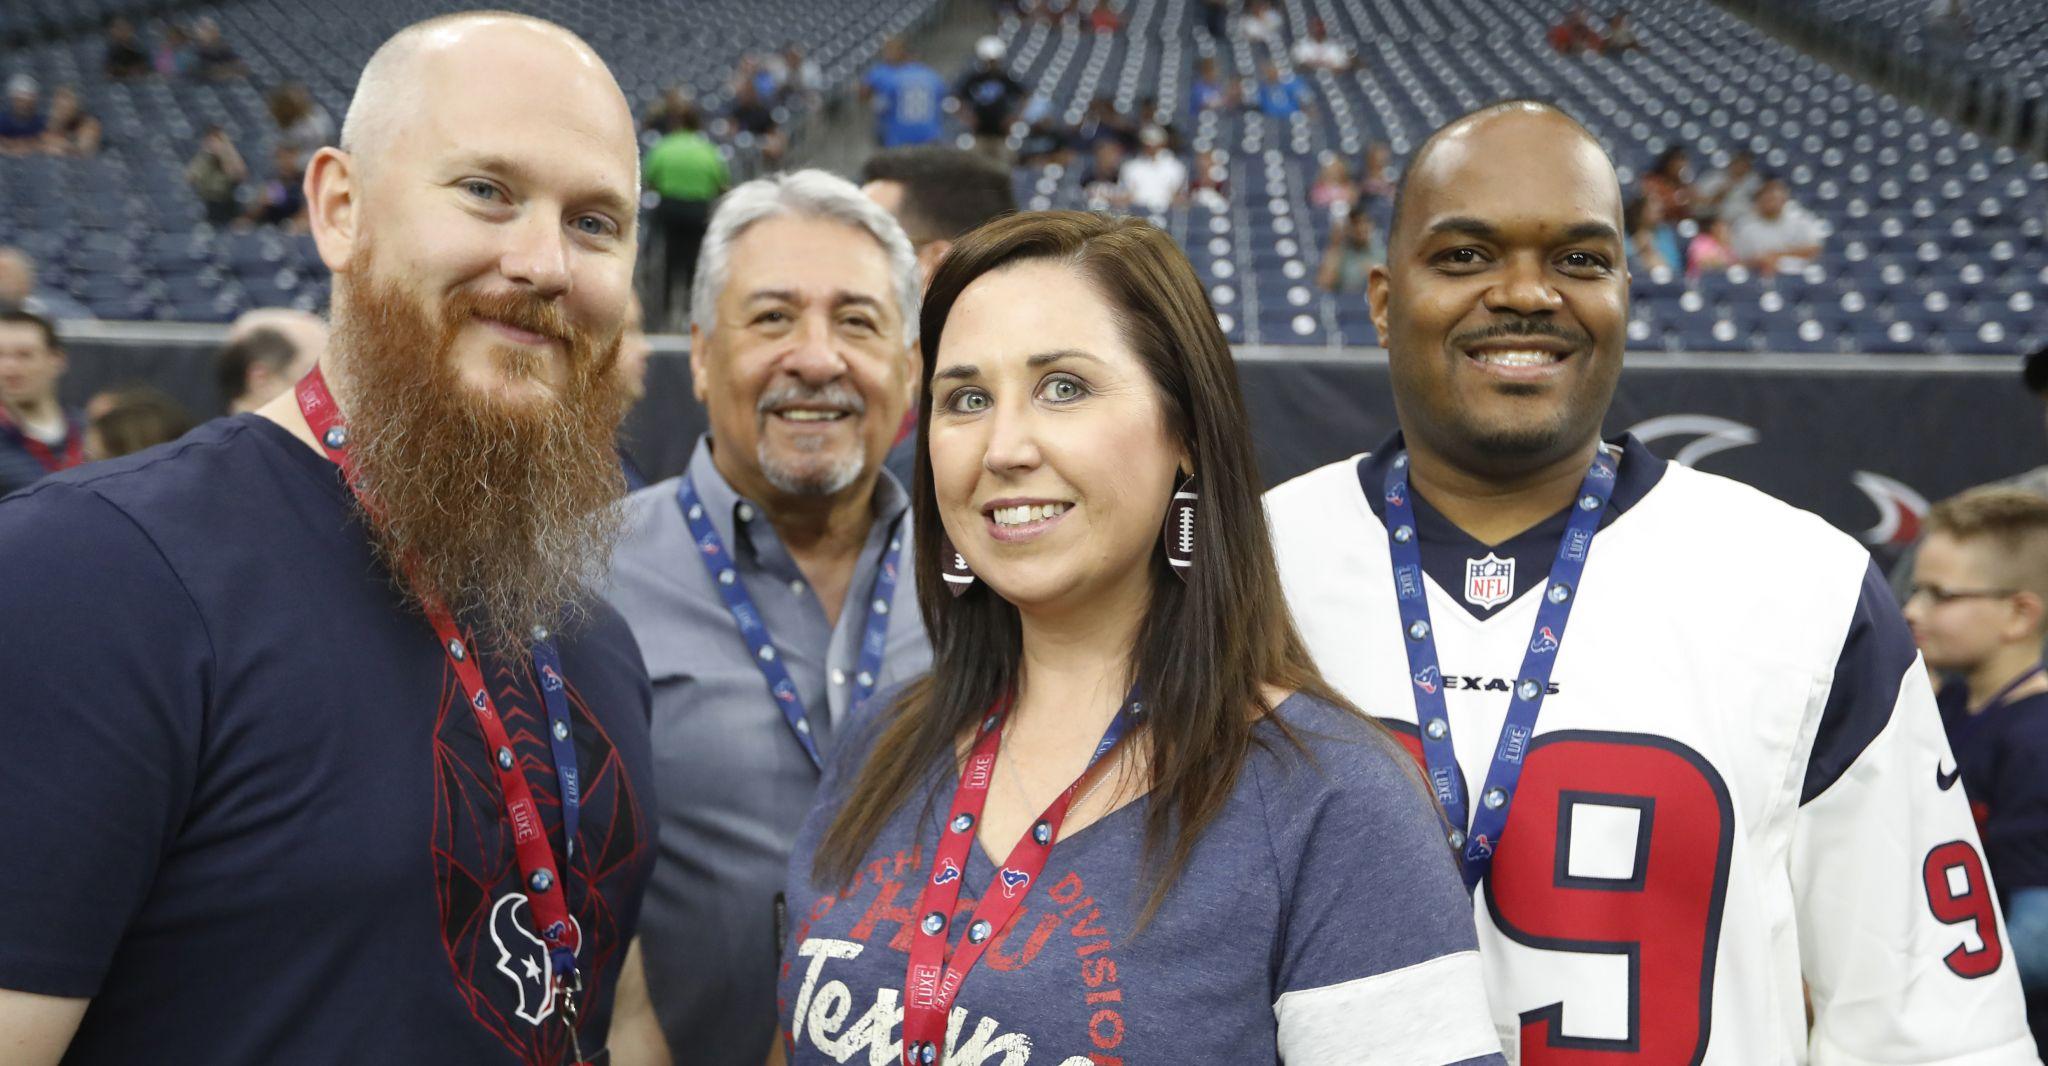 Photos: Fans at Texans-Lions preseason game